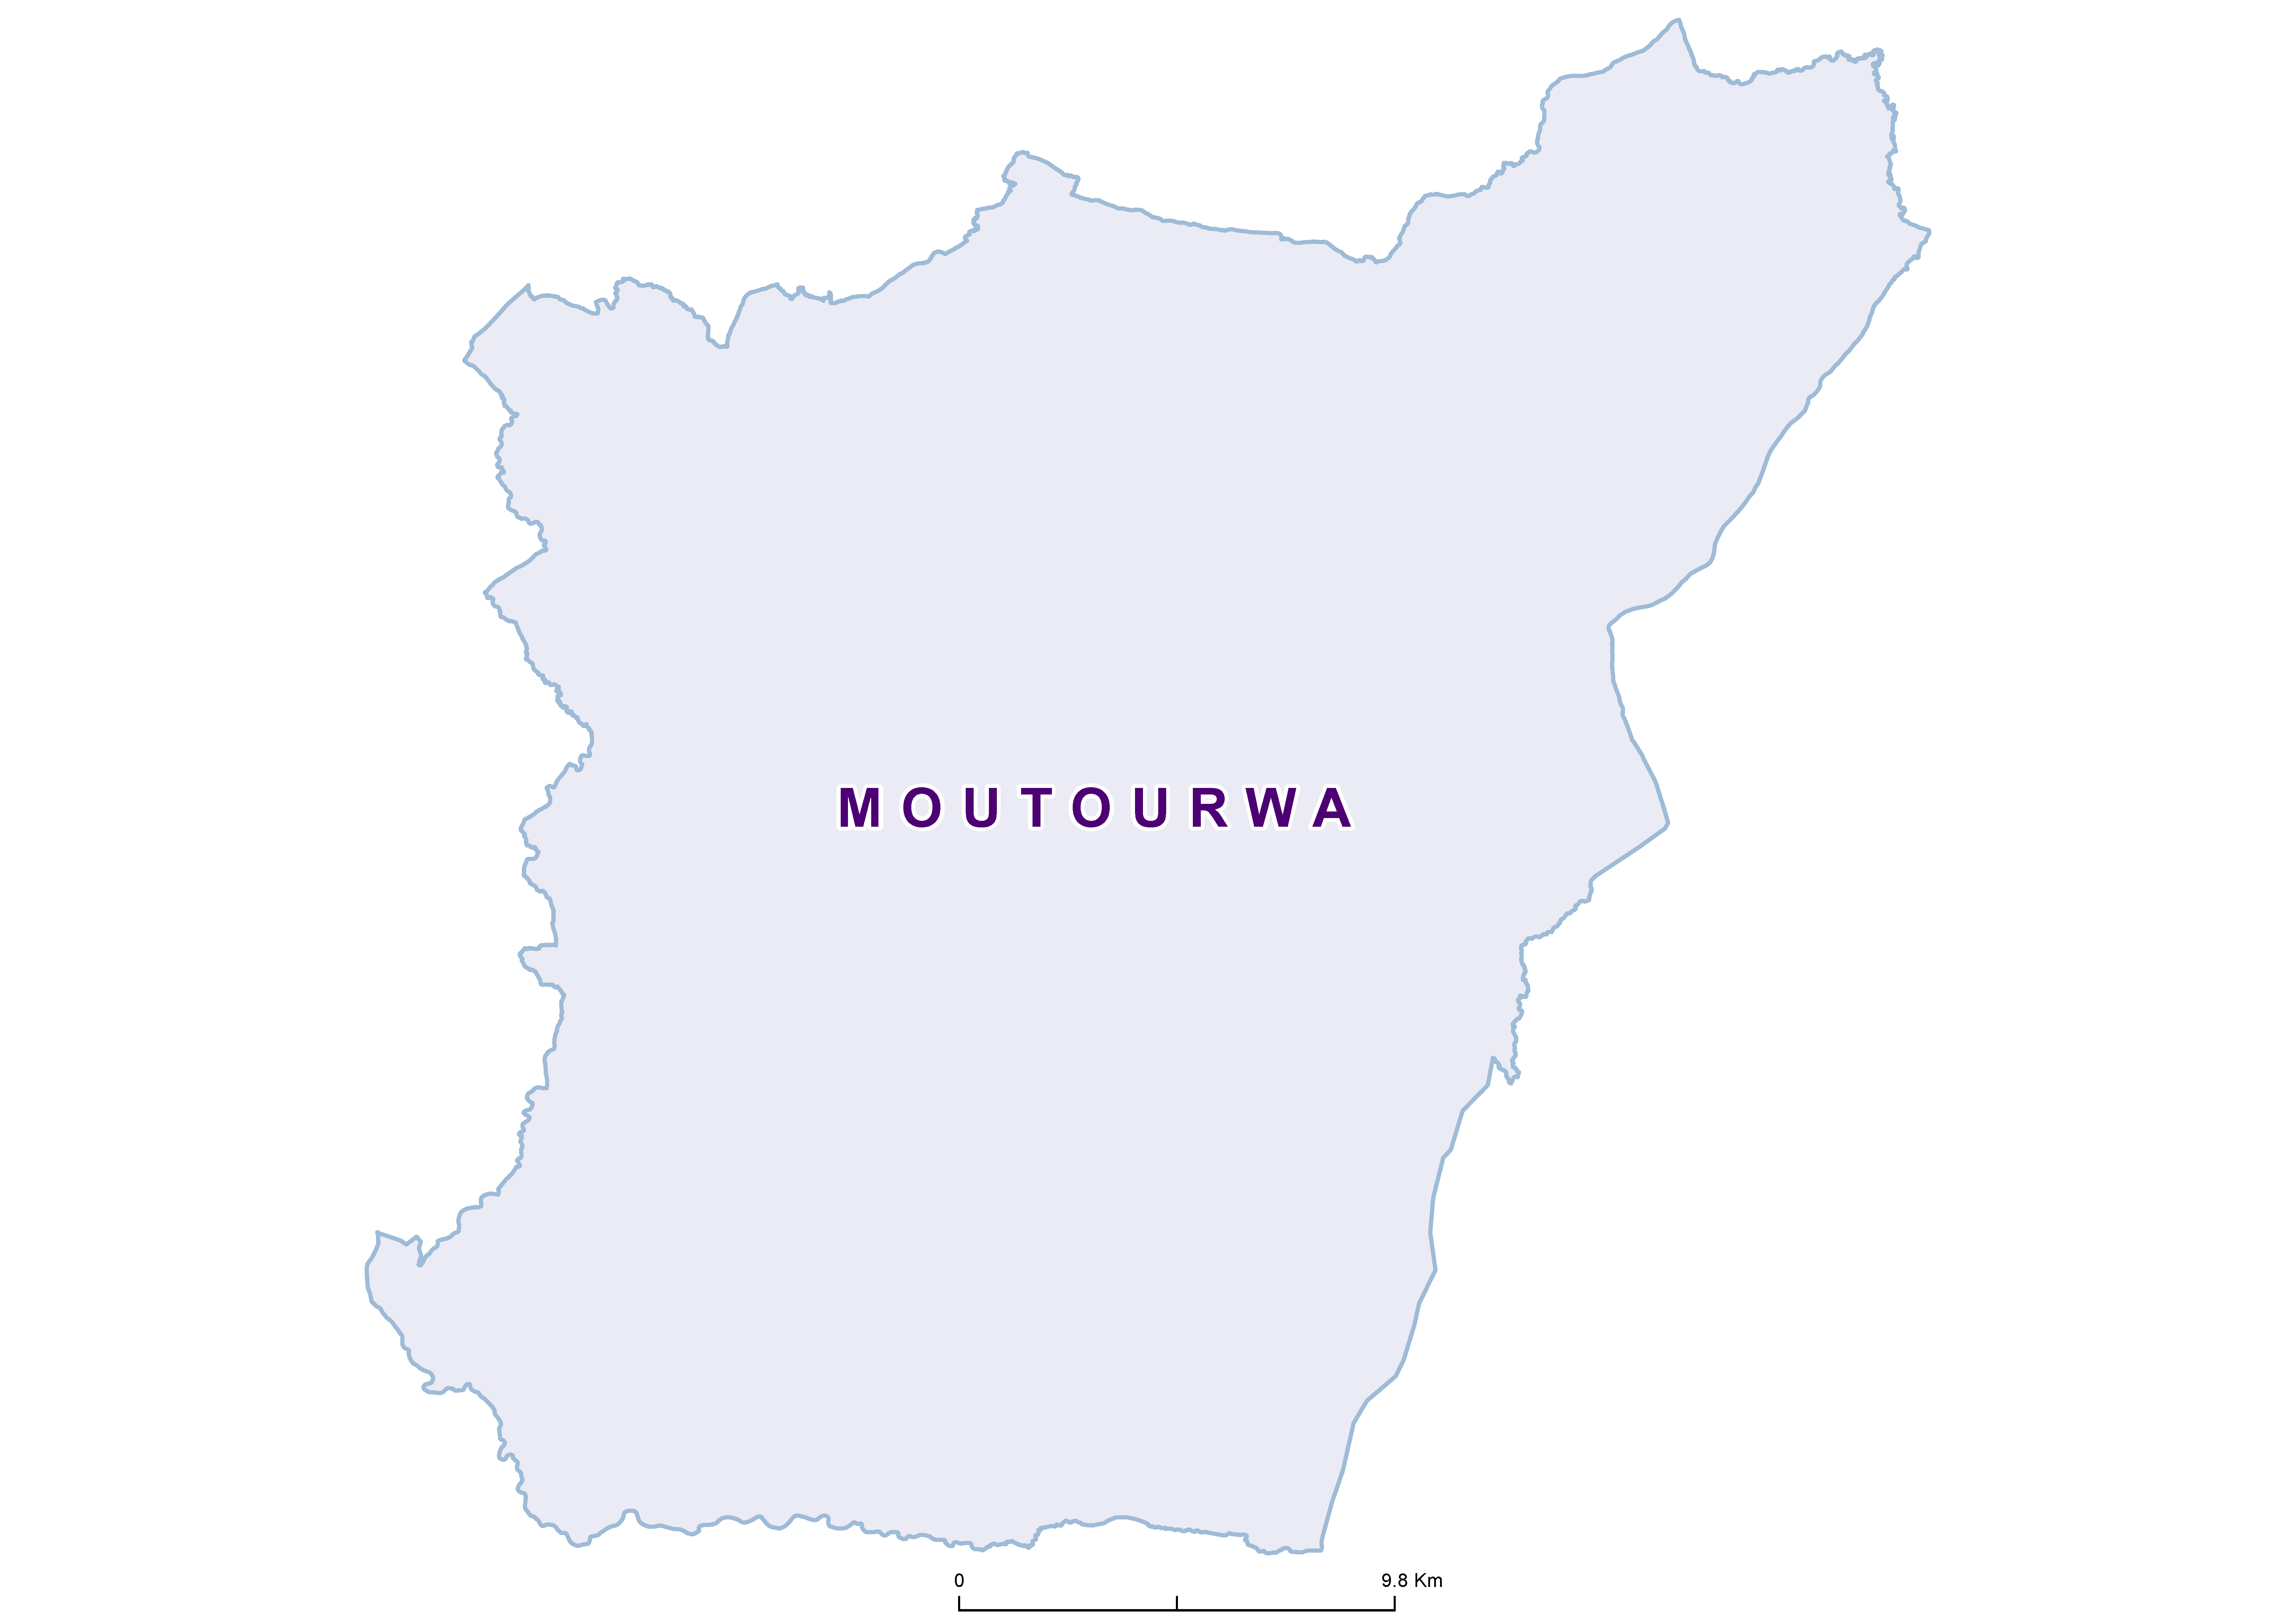 Moutourwa Max STH 20180001